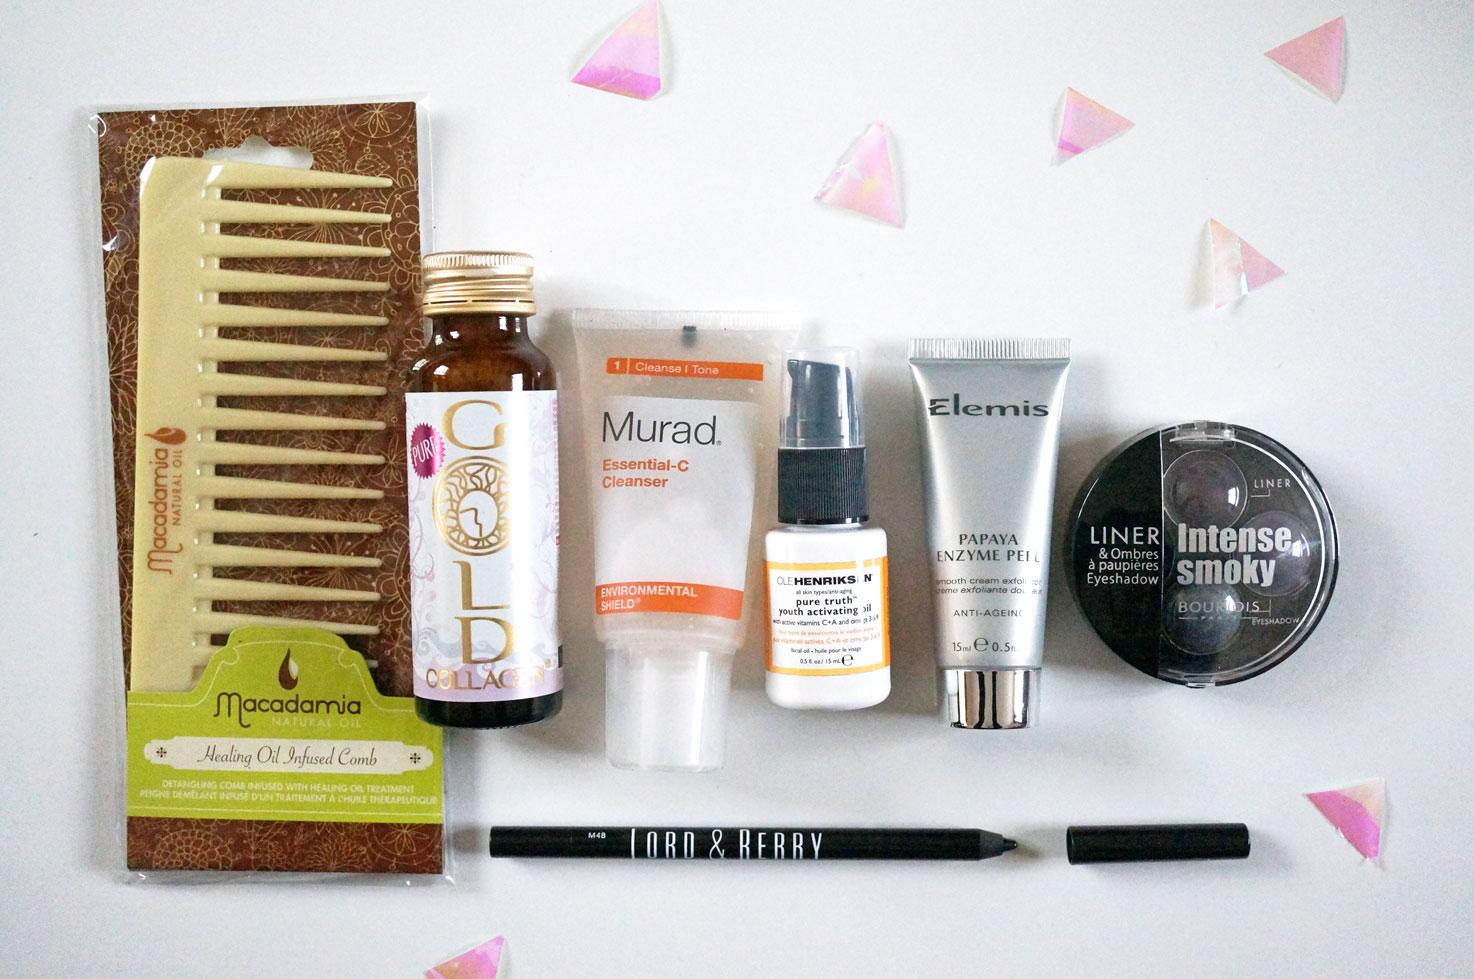 Lookfantastic Beauty Box December Review Thou Shalt